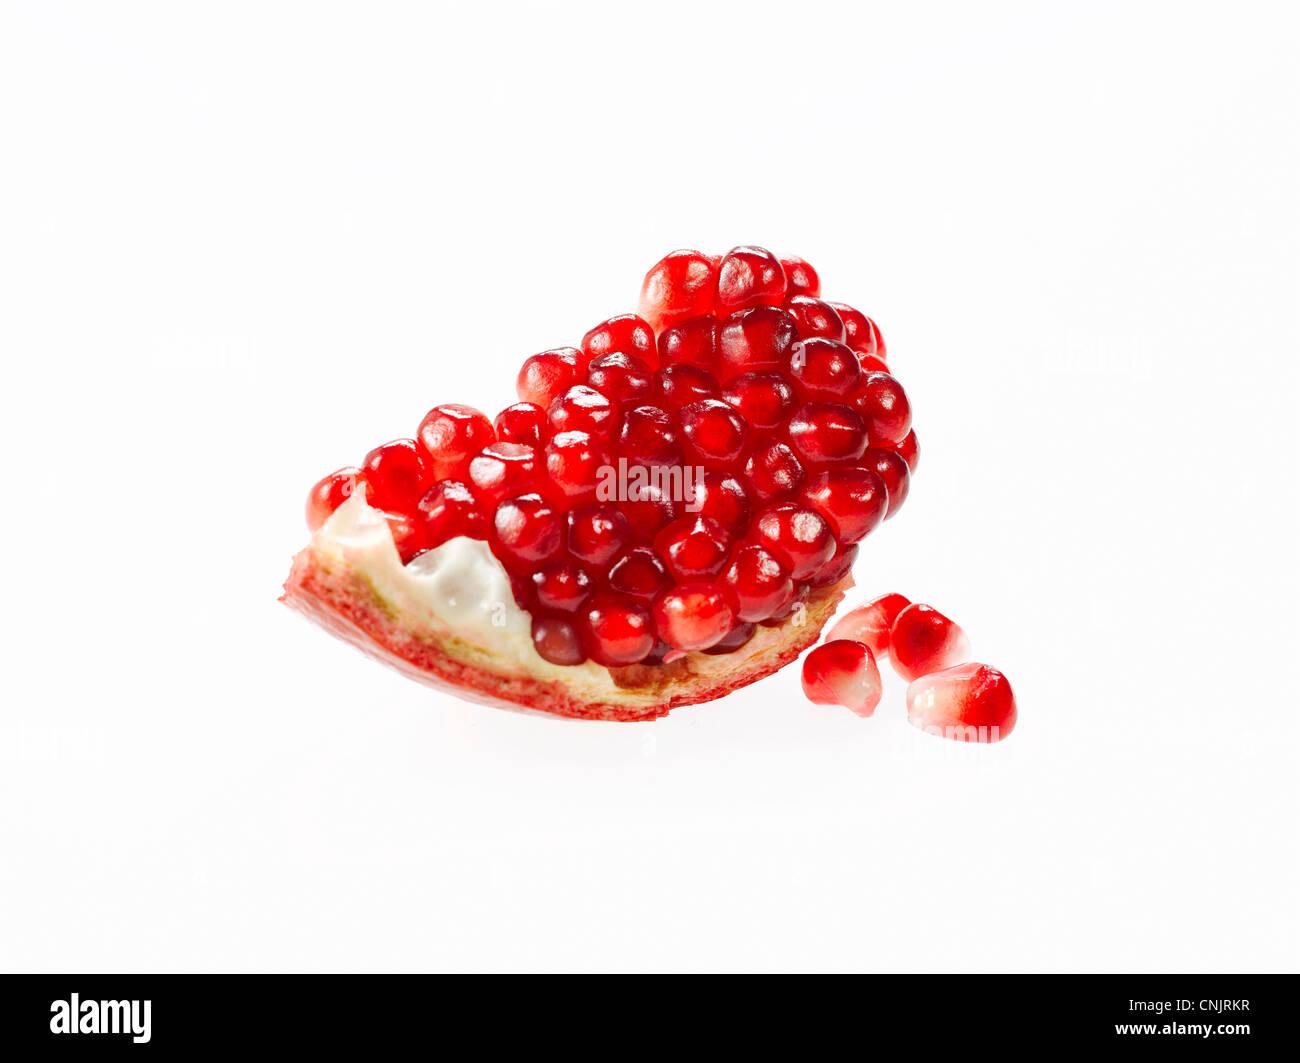 pomegranate seeds - Stock Image